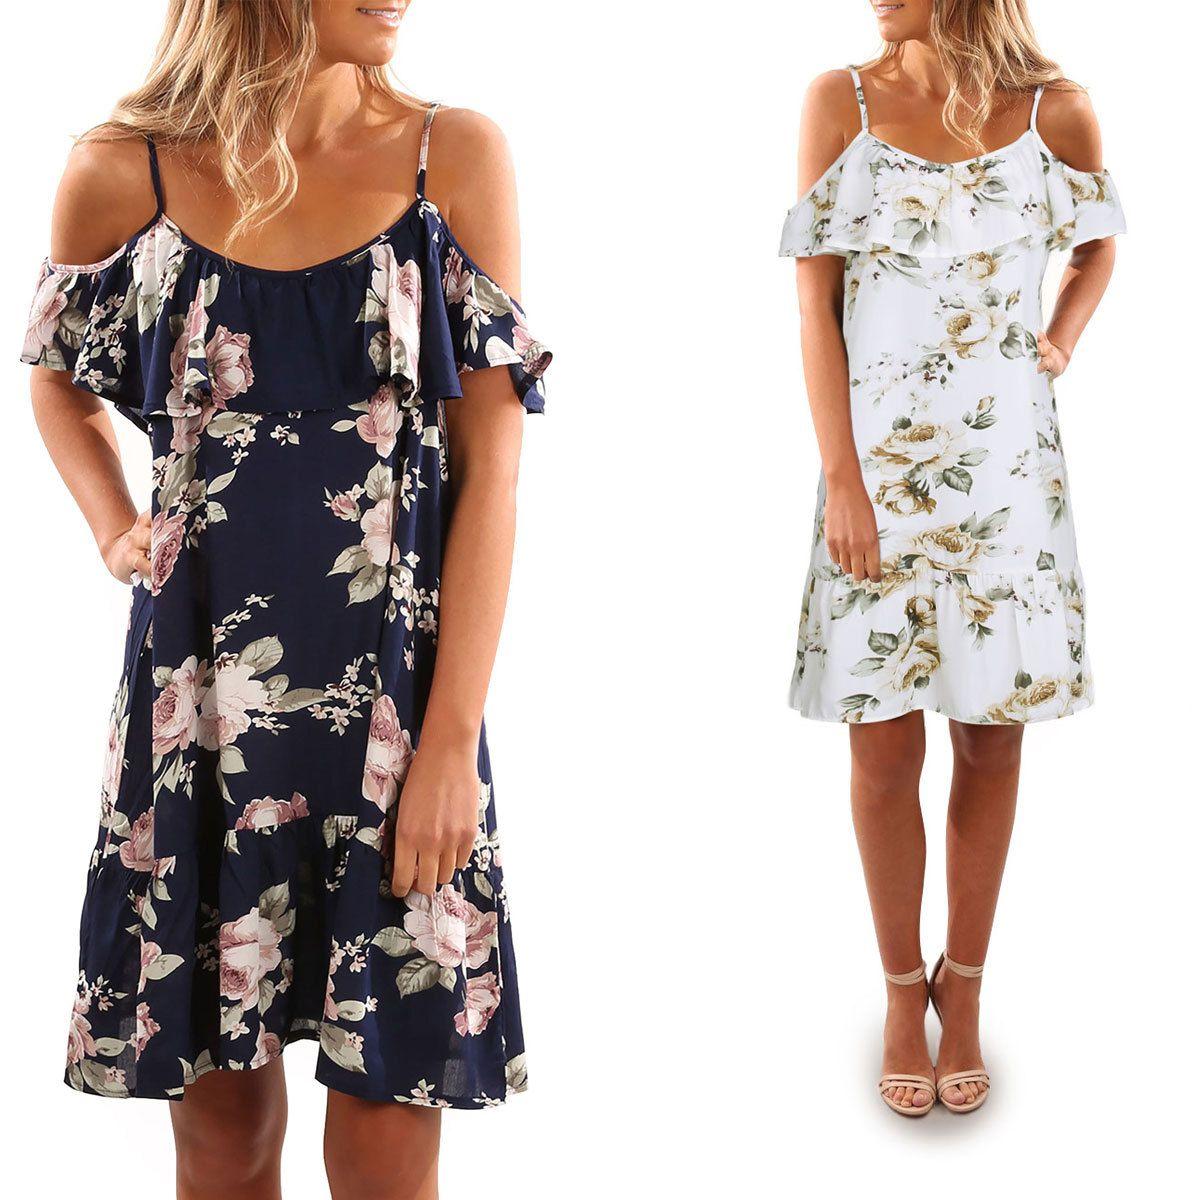 0573259b7 Compre 2018 Mujeres Off Hombro Estampado Floral Plisado Verano Casual  Vestido Strapless Ruffles Holiday Beach Mini Correa Shift Dress AM073 A   33.21 Del ...